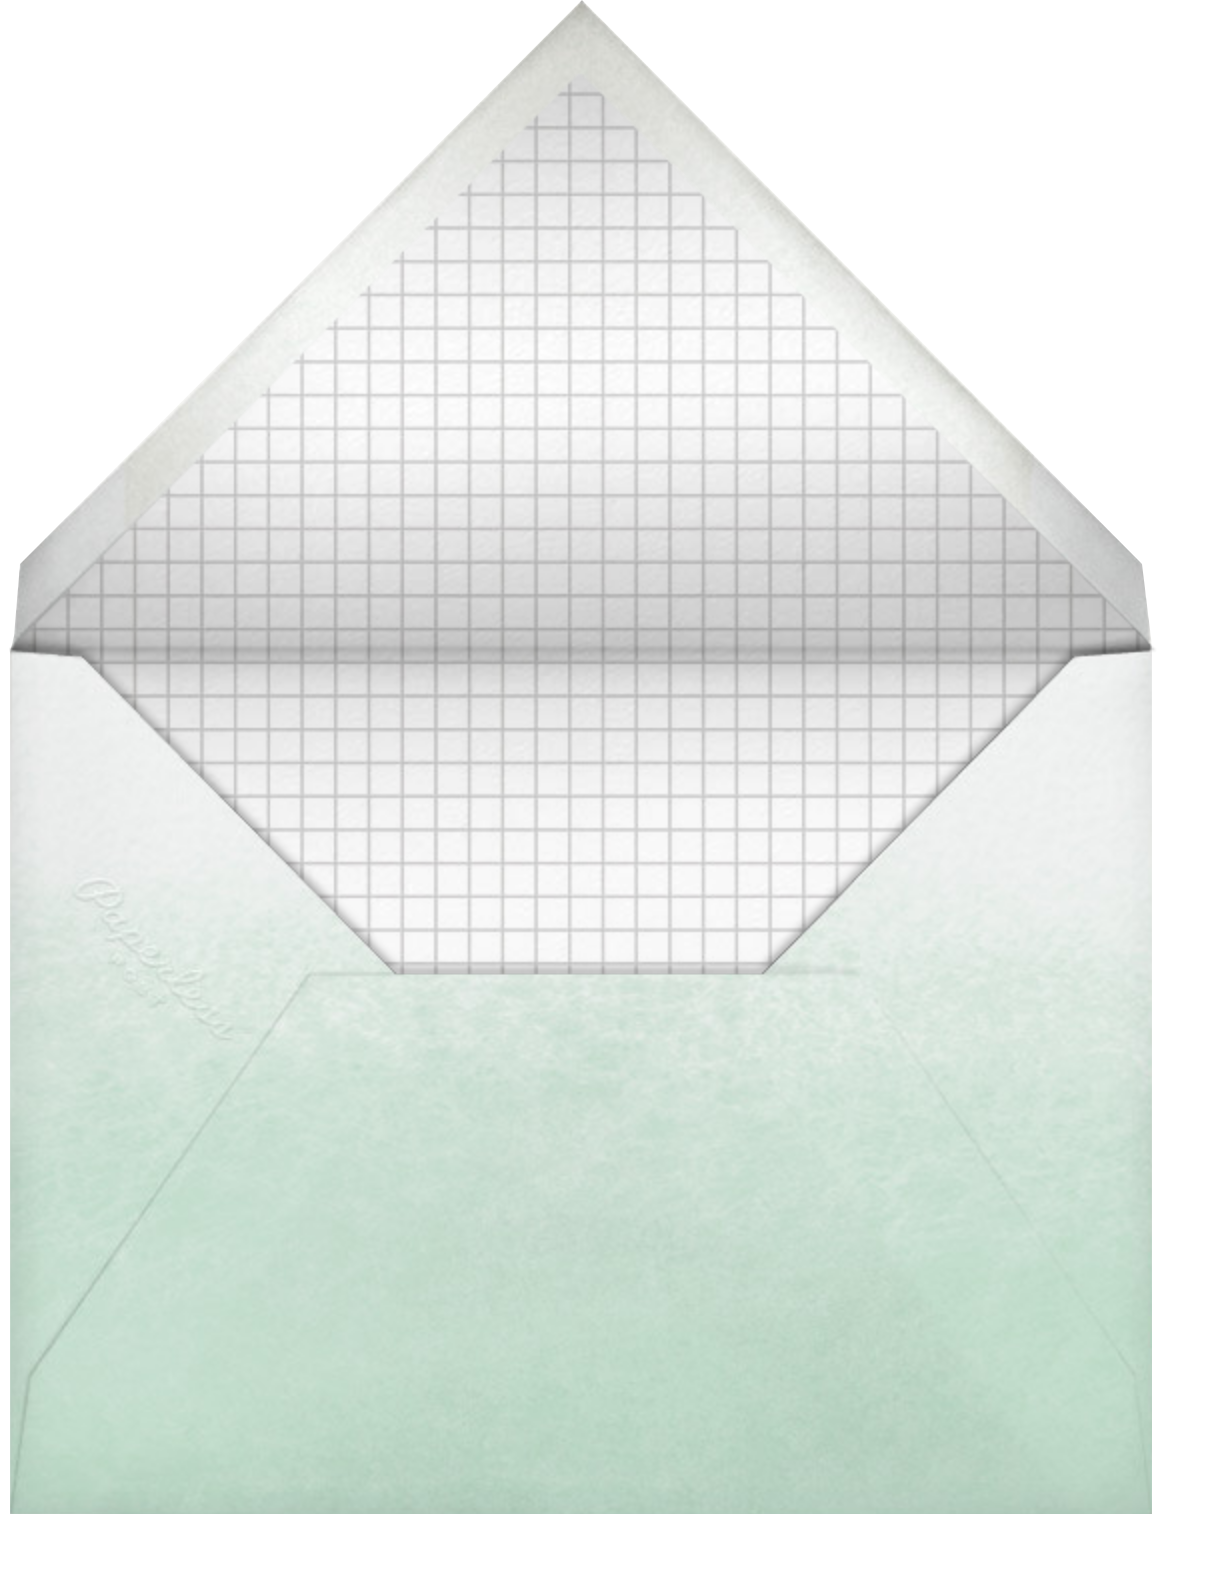 Relax - Fair - Paperless Post - Envelope